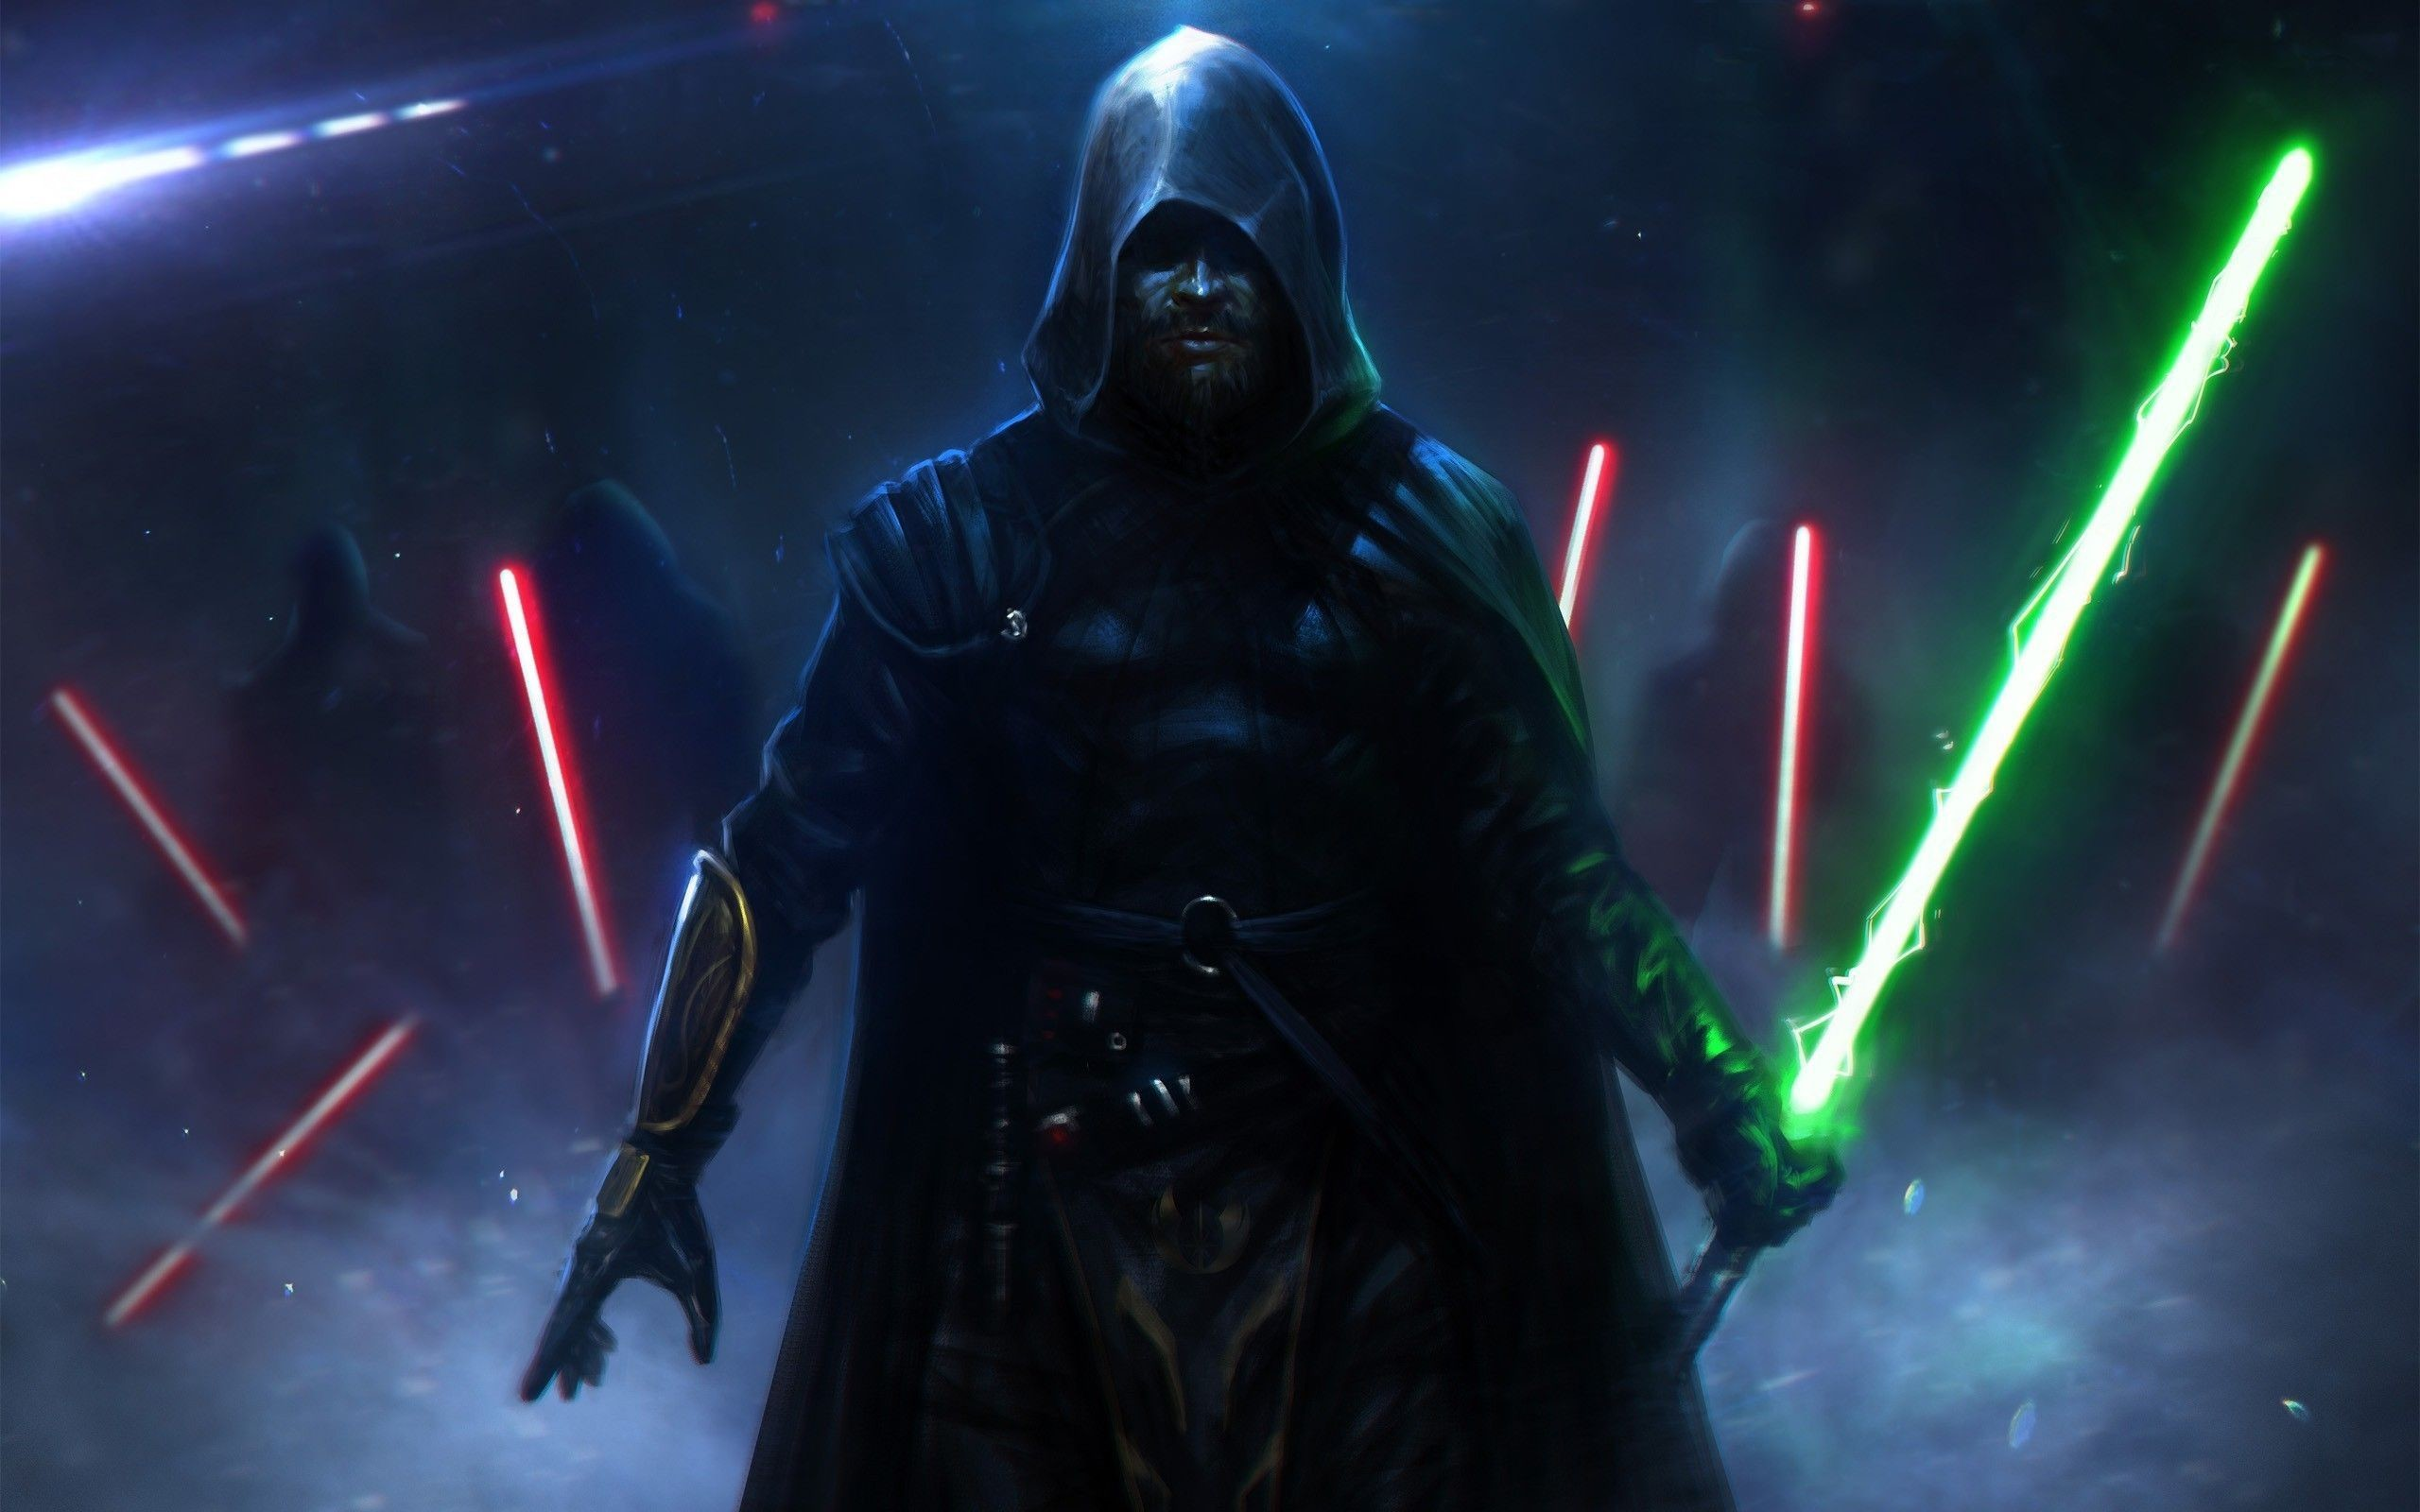 Res: 2560x1600, Star Wars Jedi Wallpaper High Quality Resolution